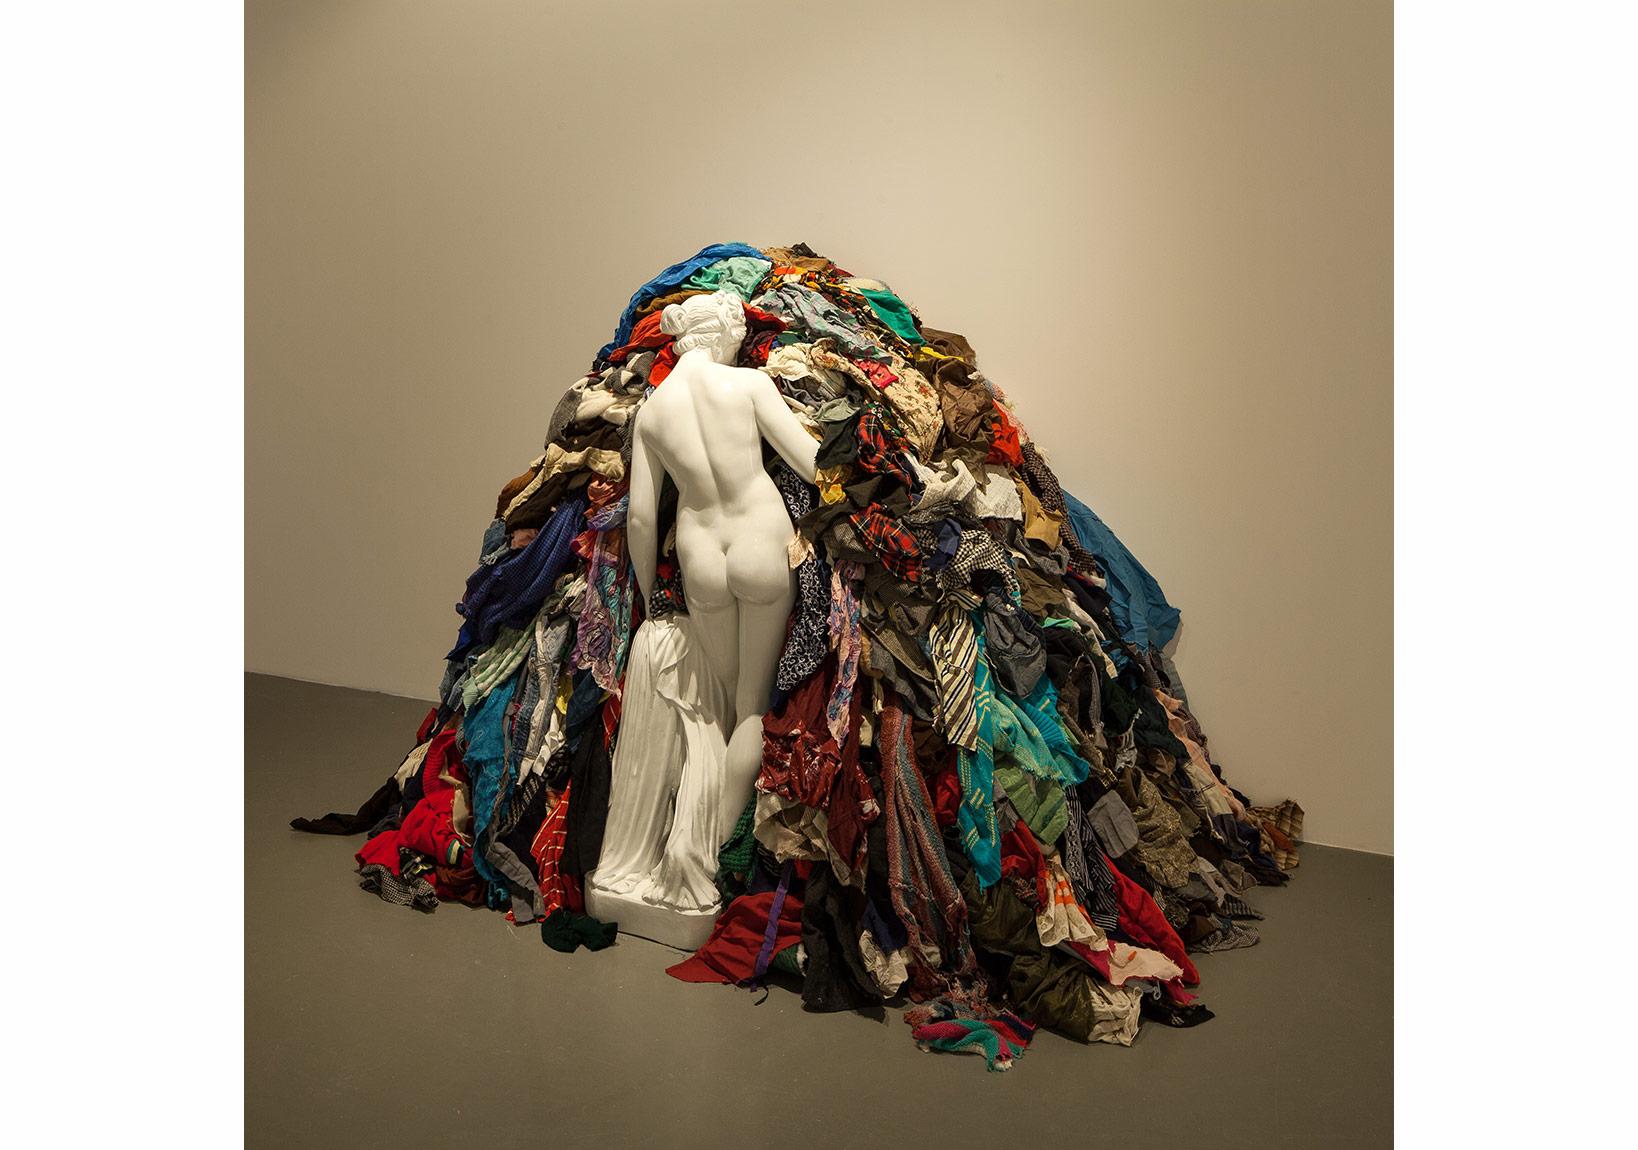 Michelangelo Pistoletto, Venus of the rags, Venegle degli stracci, 1967-1974, Marble and textiles, 2120x3400x1100 mm phot: Sahir Uğur Eren